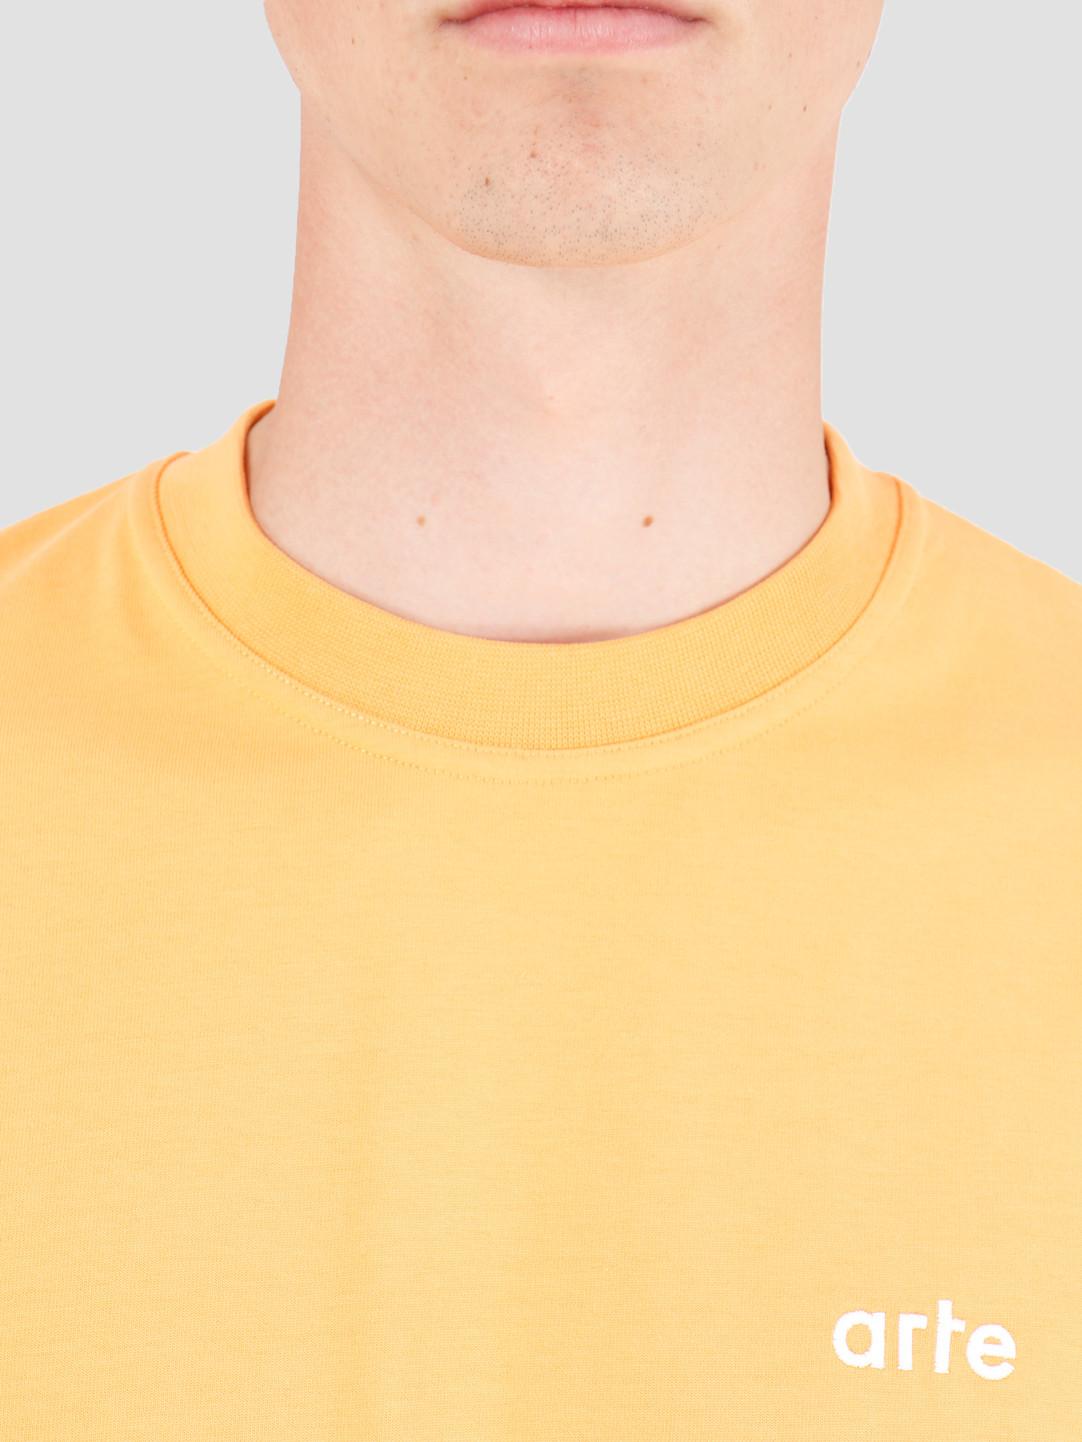 Arte Antwerp Arte Antwerp Tyler T-Shirt Orange AW19-048